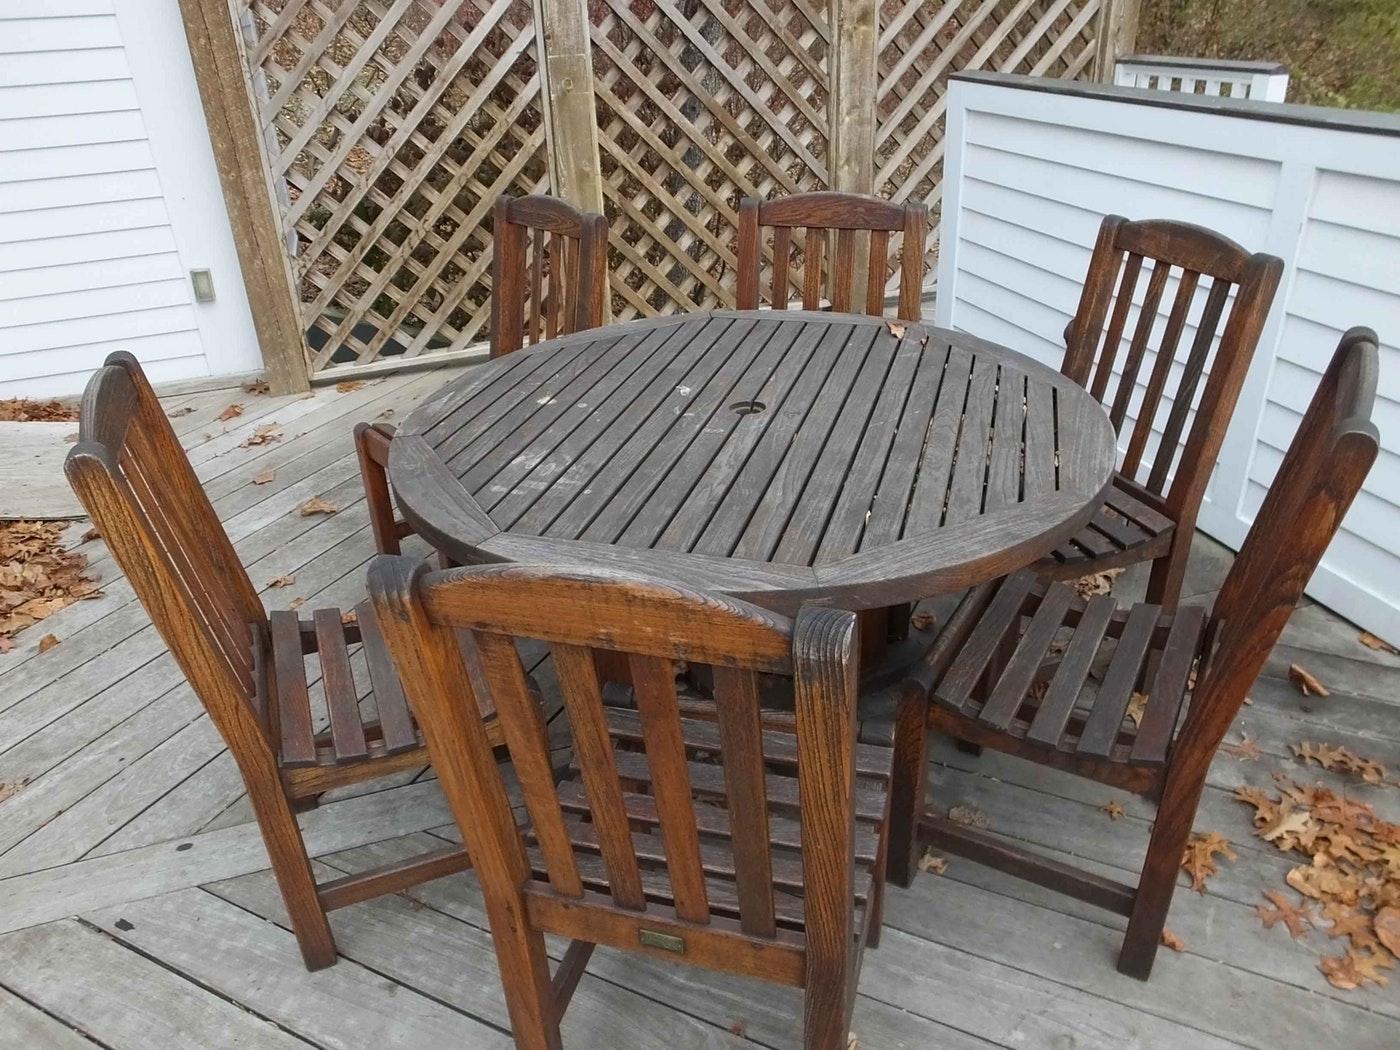 Rustic Teak Smith And Hawken Outdoor Furniture